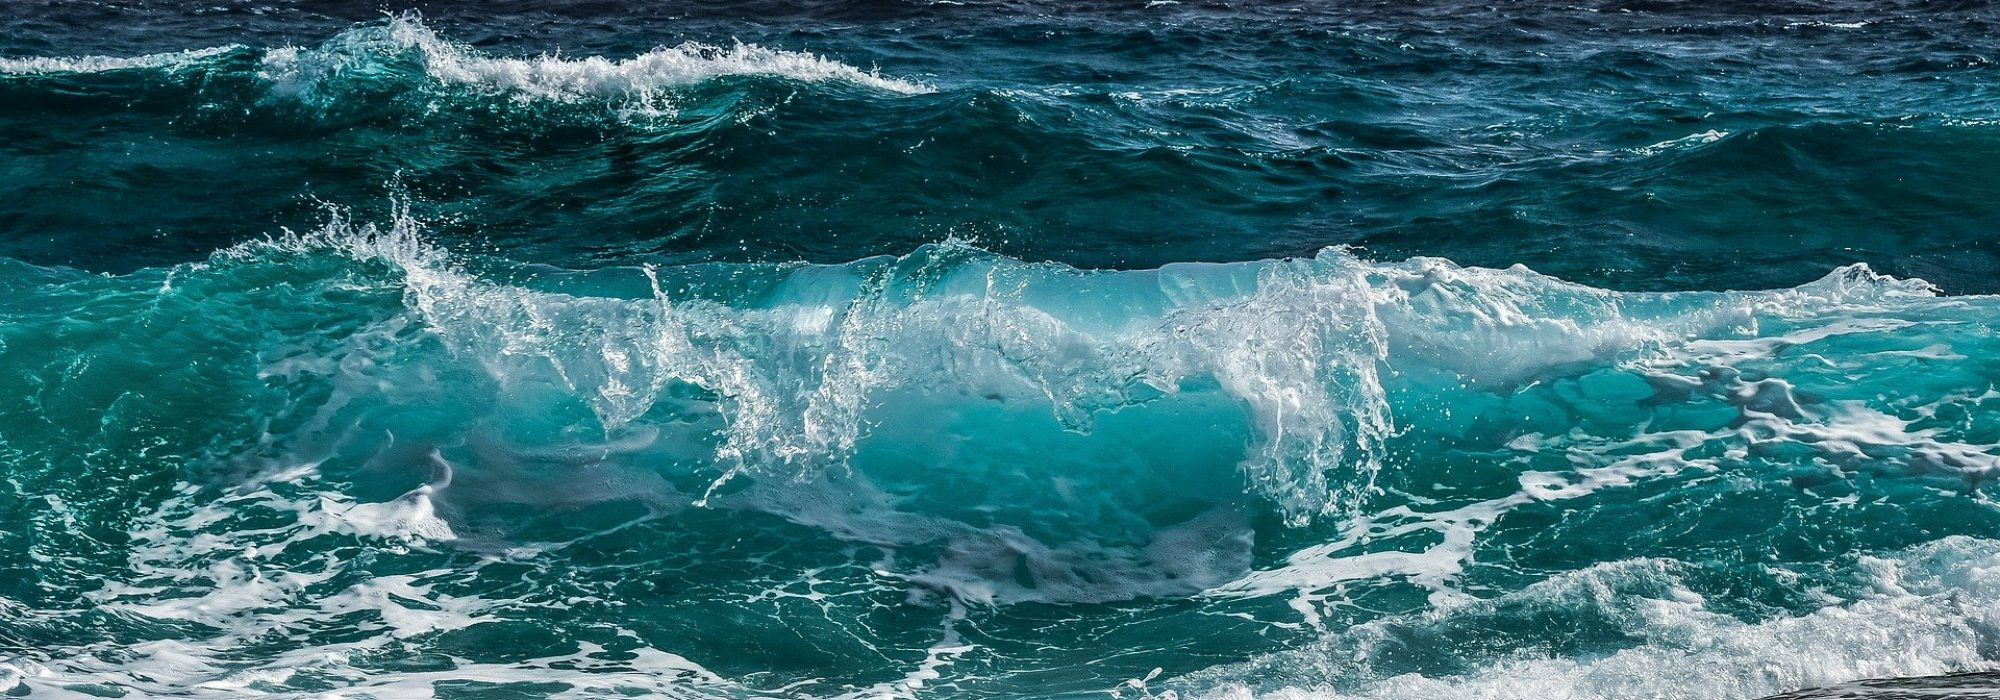 waves-3473335_1920